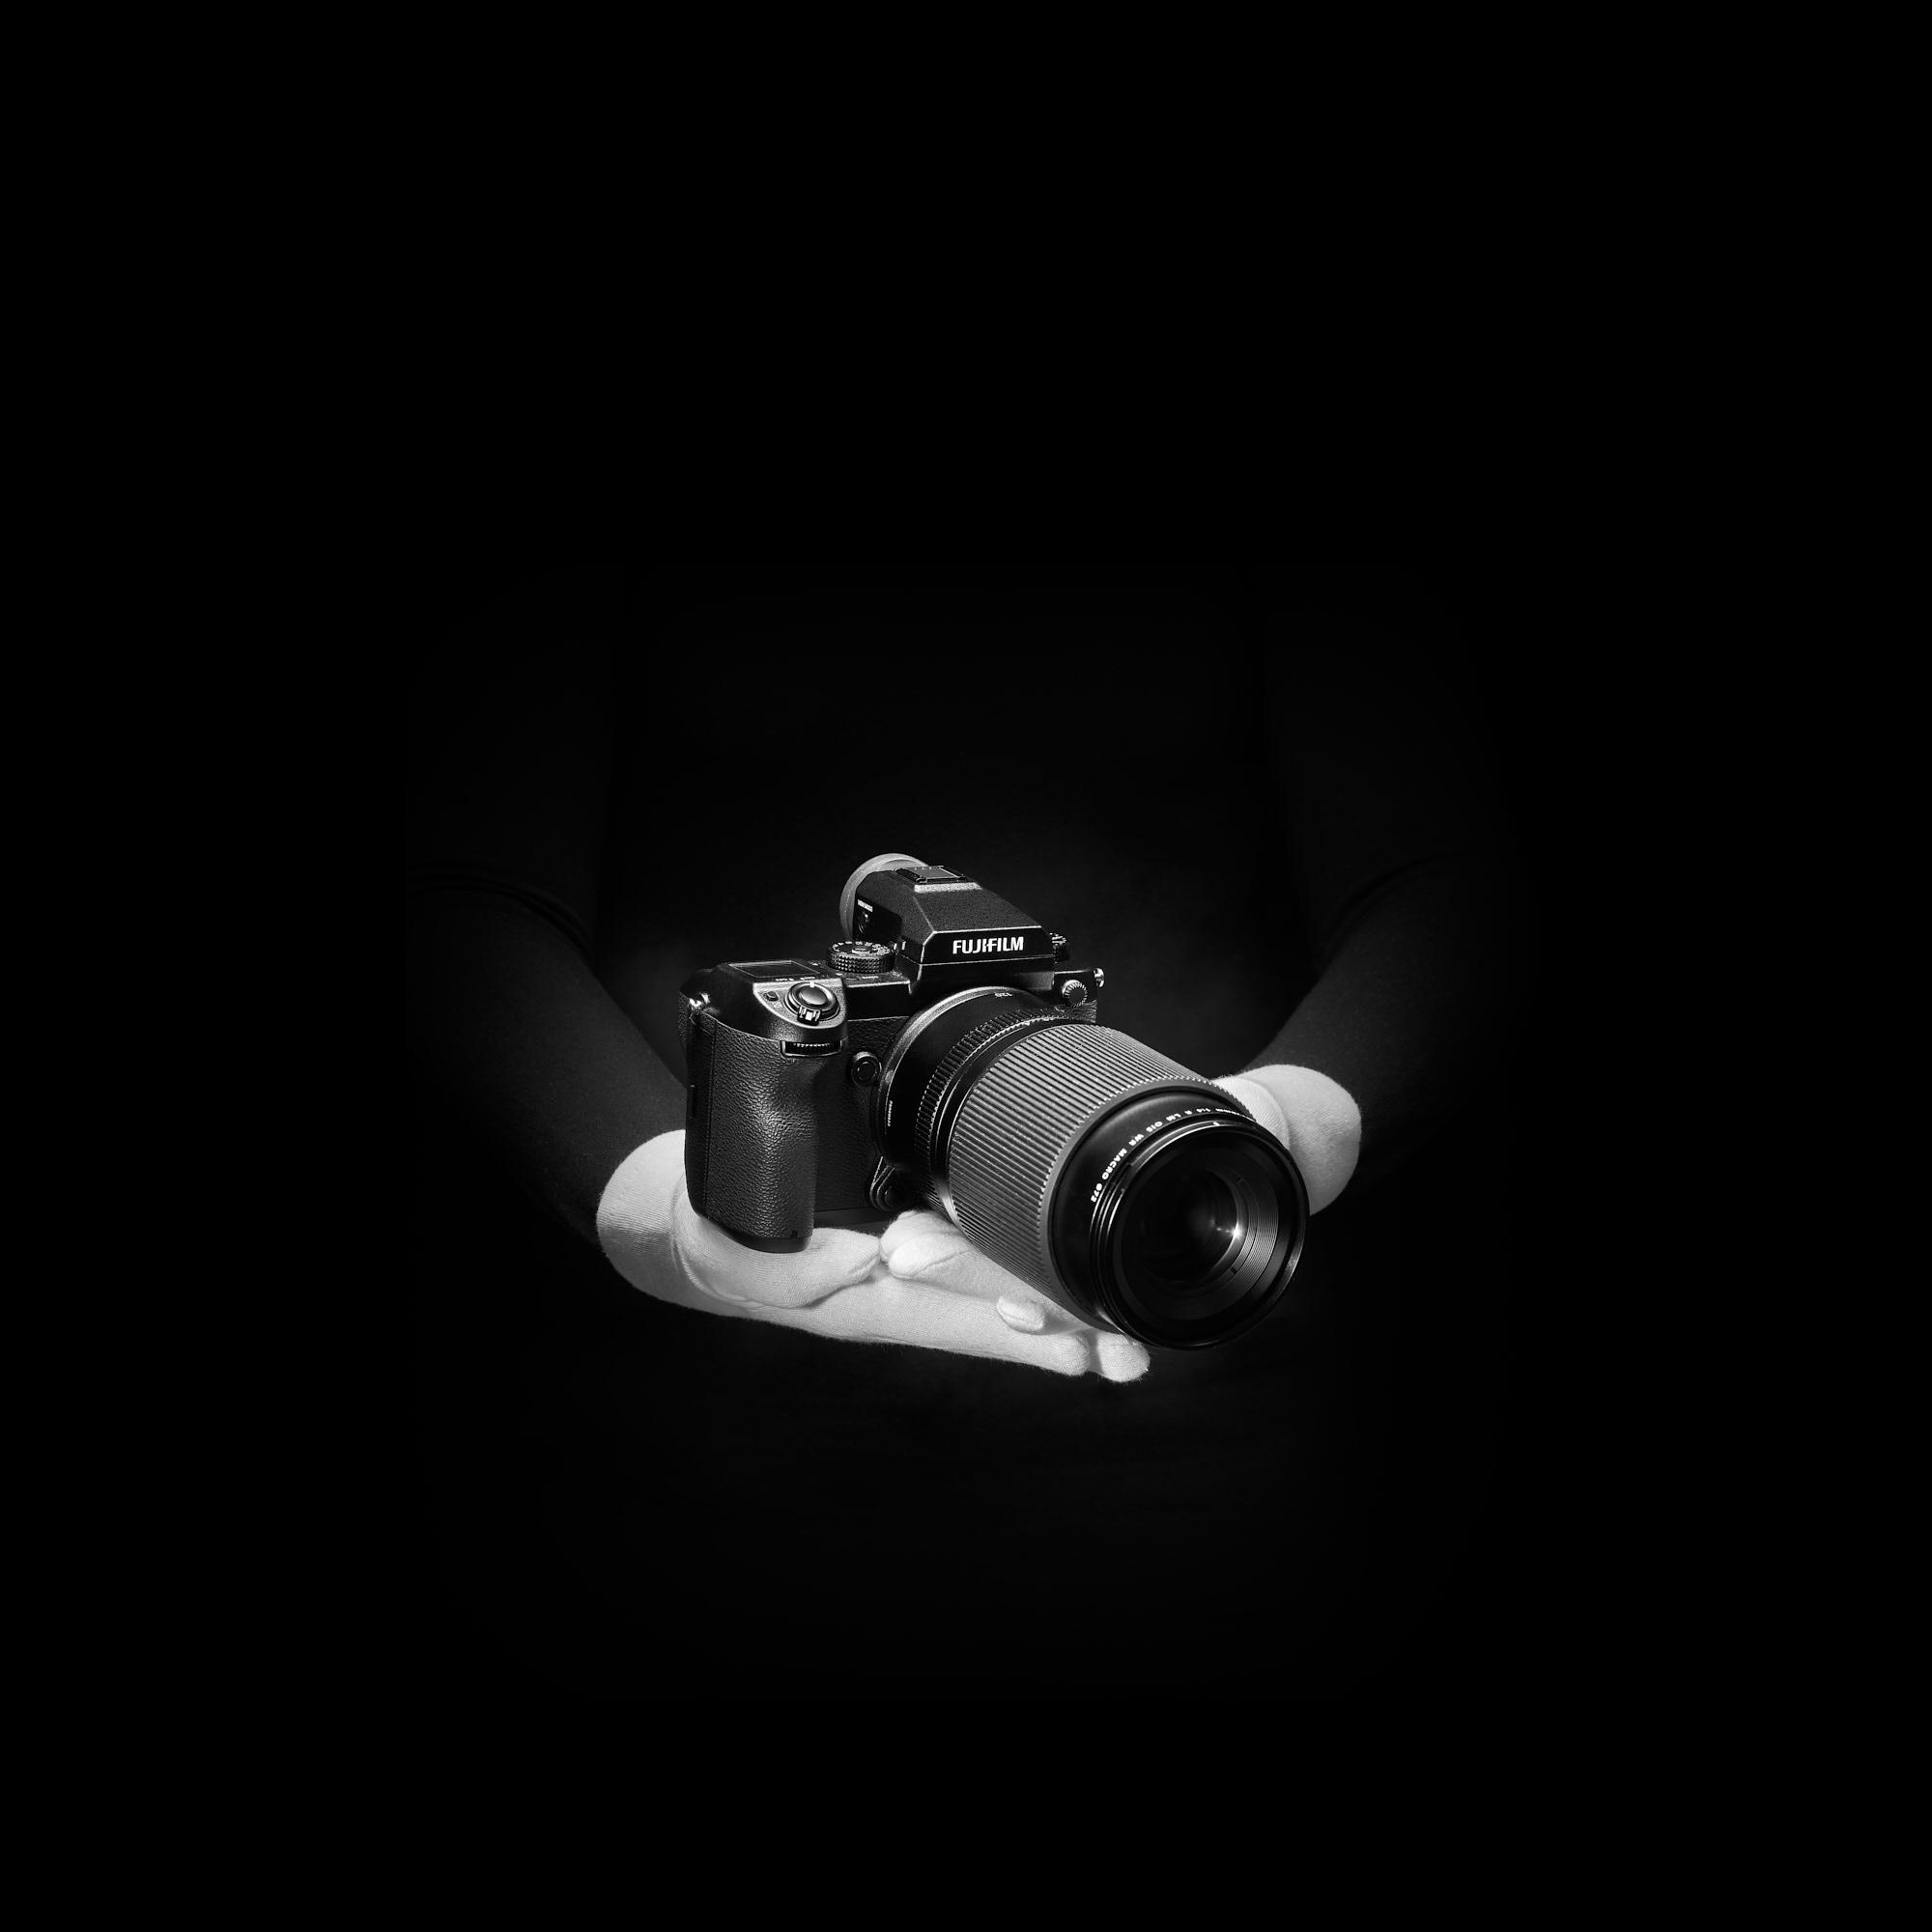 Fujifilm / Campagne Nationale -